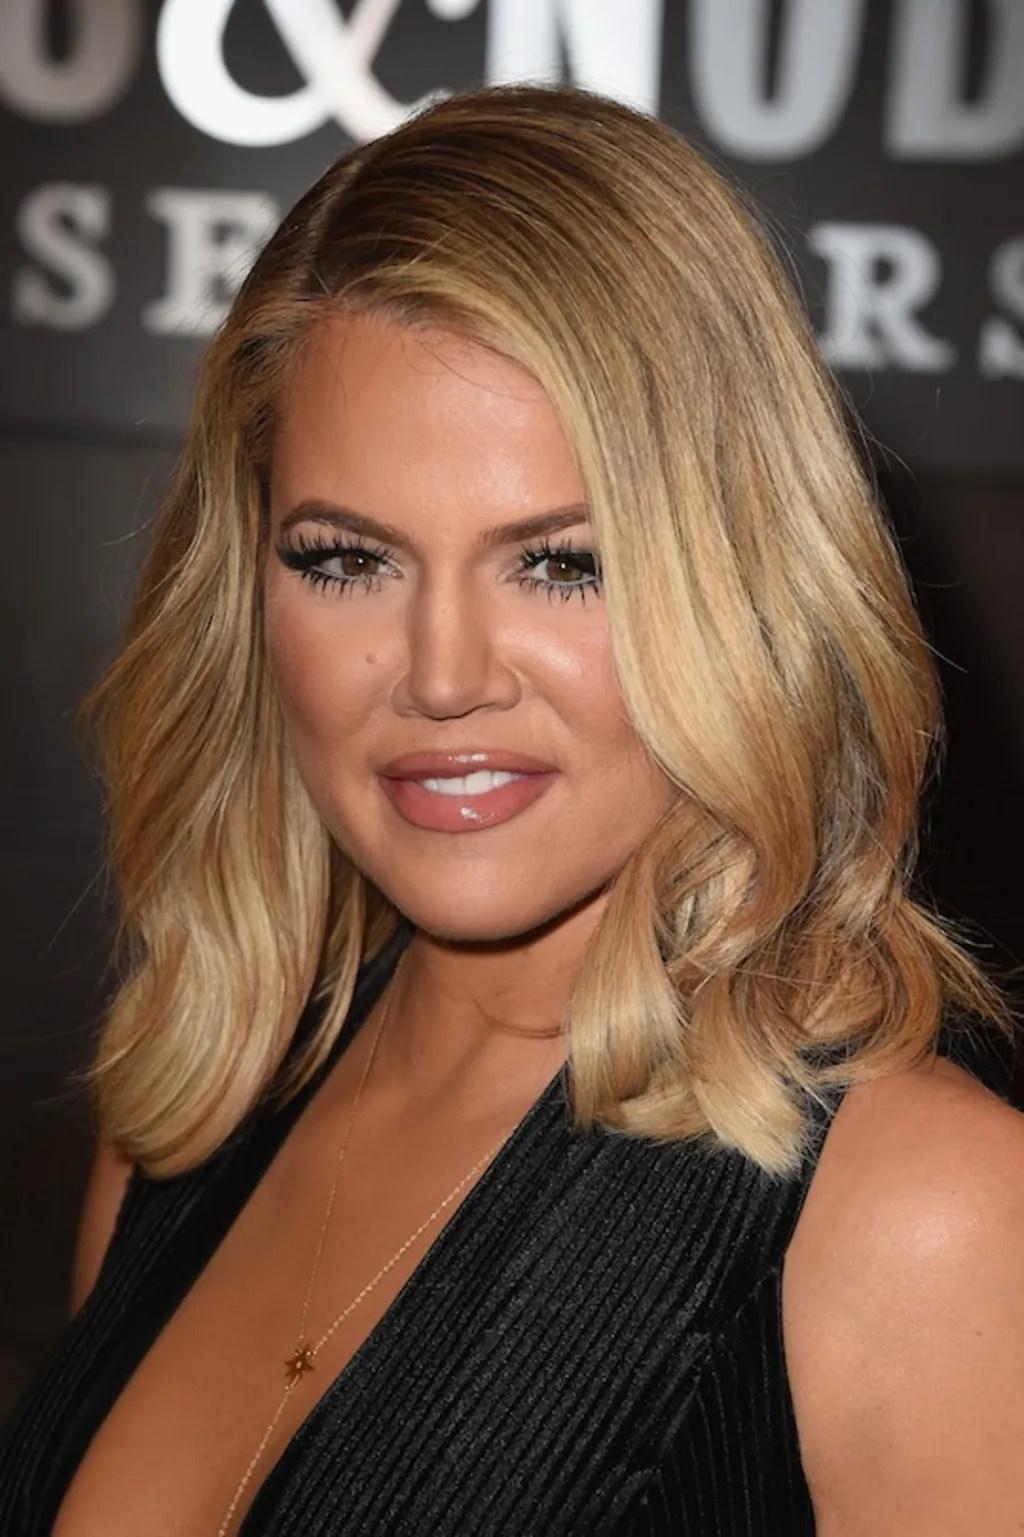 Khloe Kardashian's Short Hair Is The Most Versatile Cut Ever